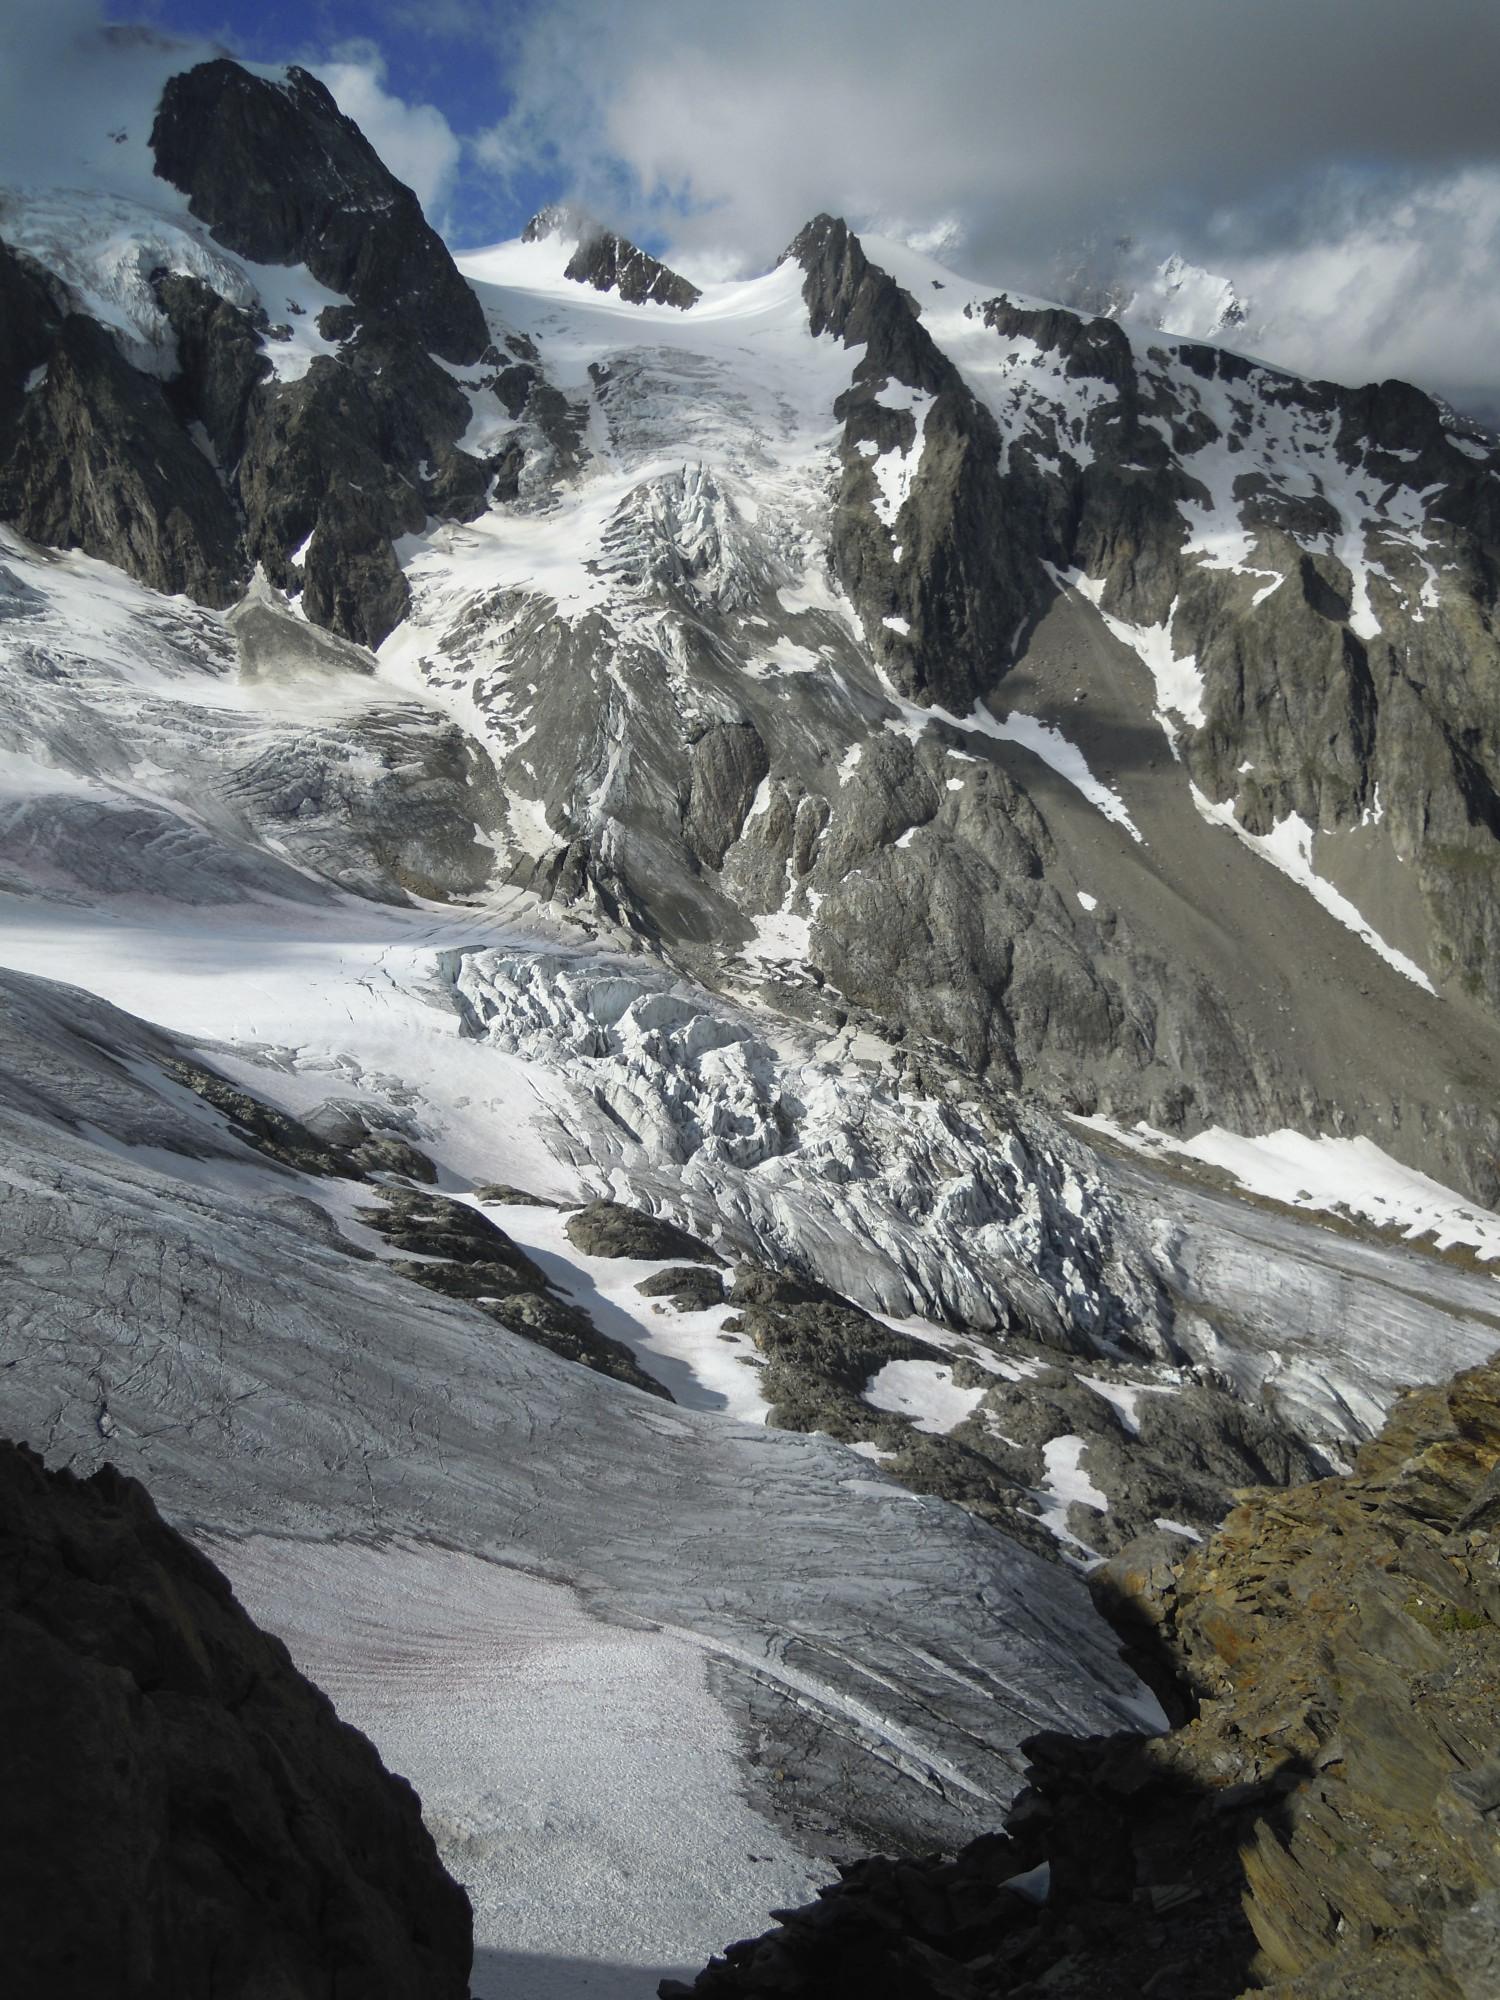 Aiguille des Glaciers : Arête Kuffner - Camptocamp.org